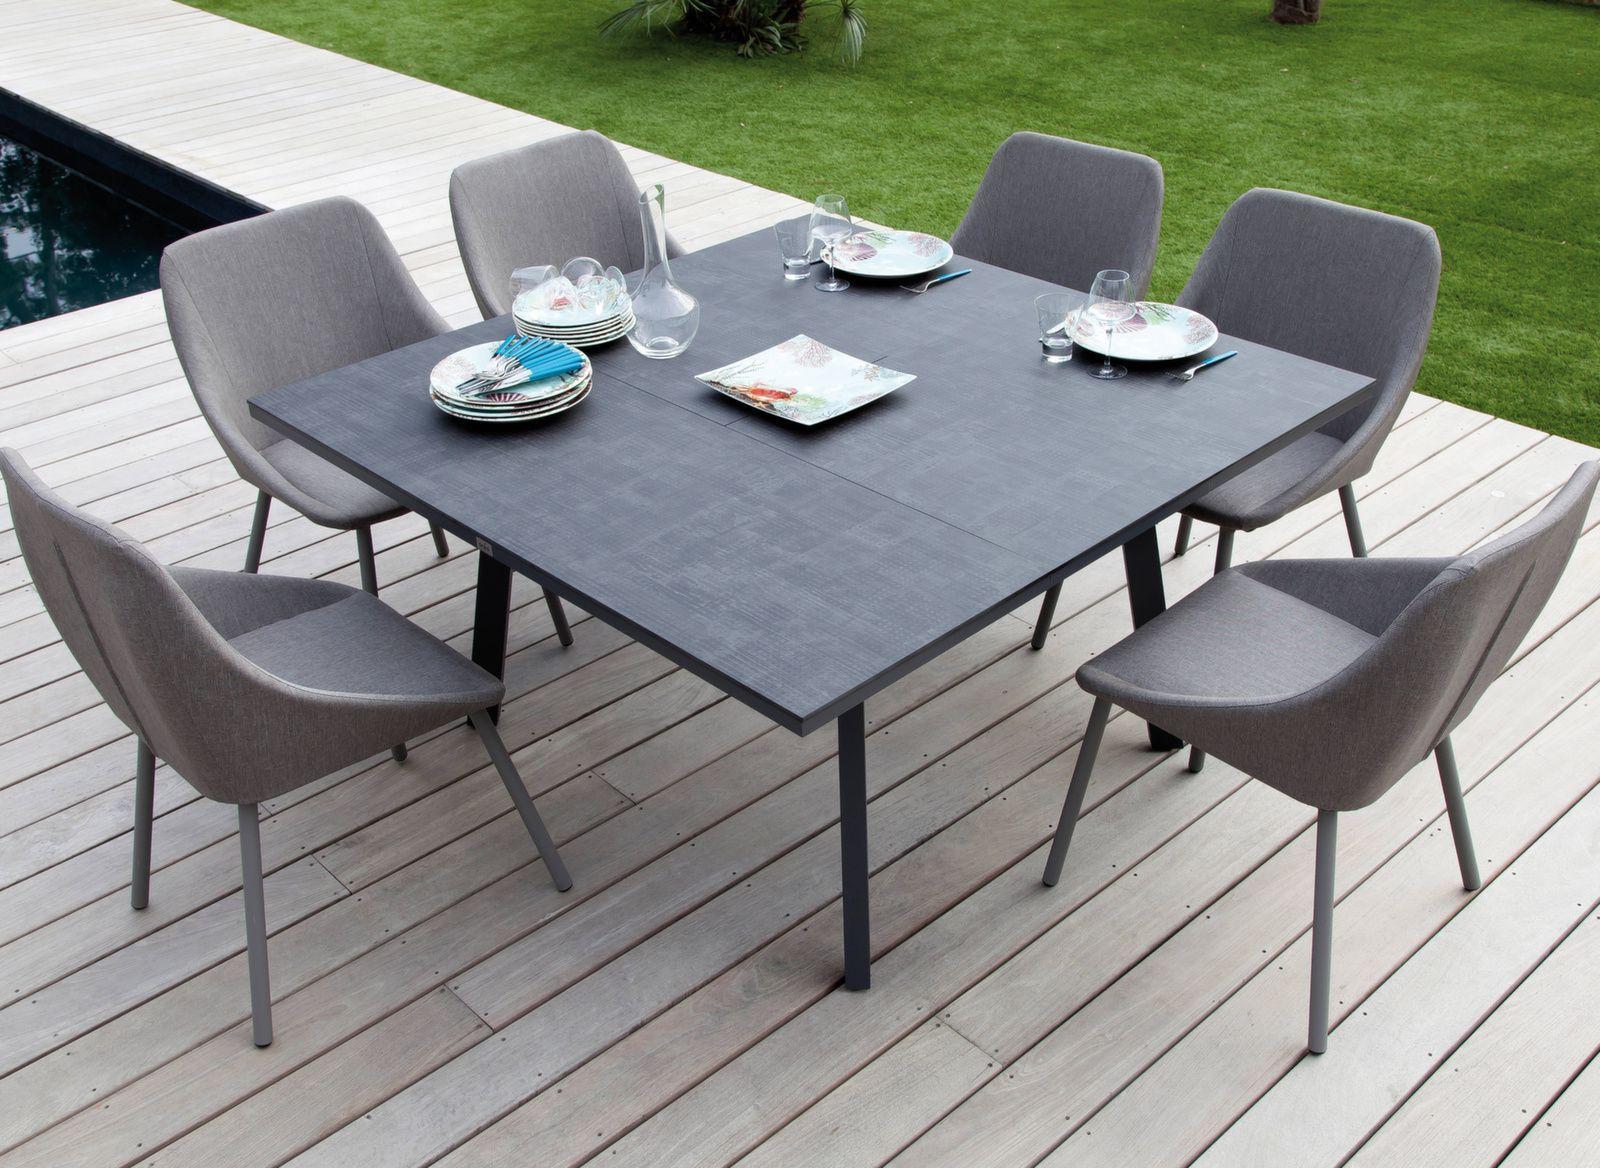 a6558405aaf77d Fauteuil Bossa - Chaises et fauteuils de jardin - Salon de jardin repas -  Proloisirs -